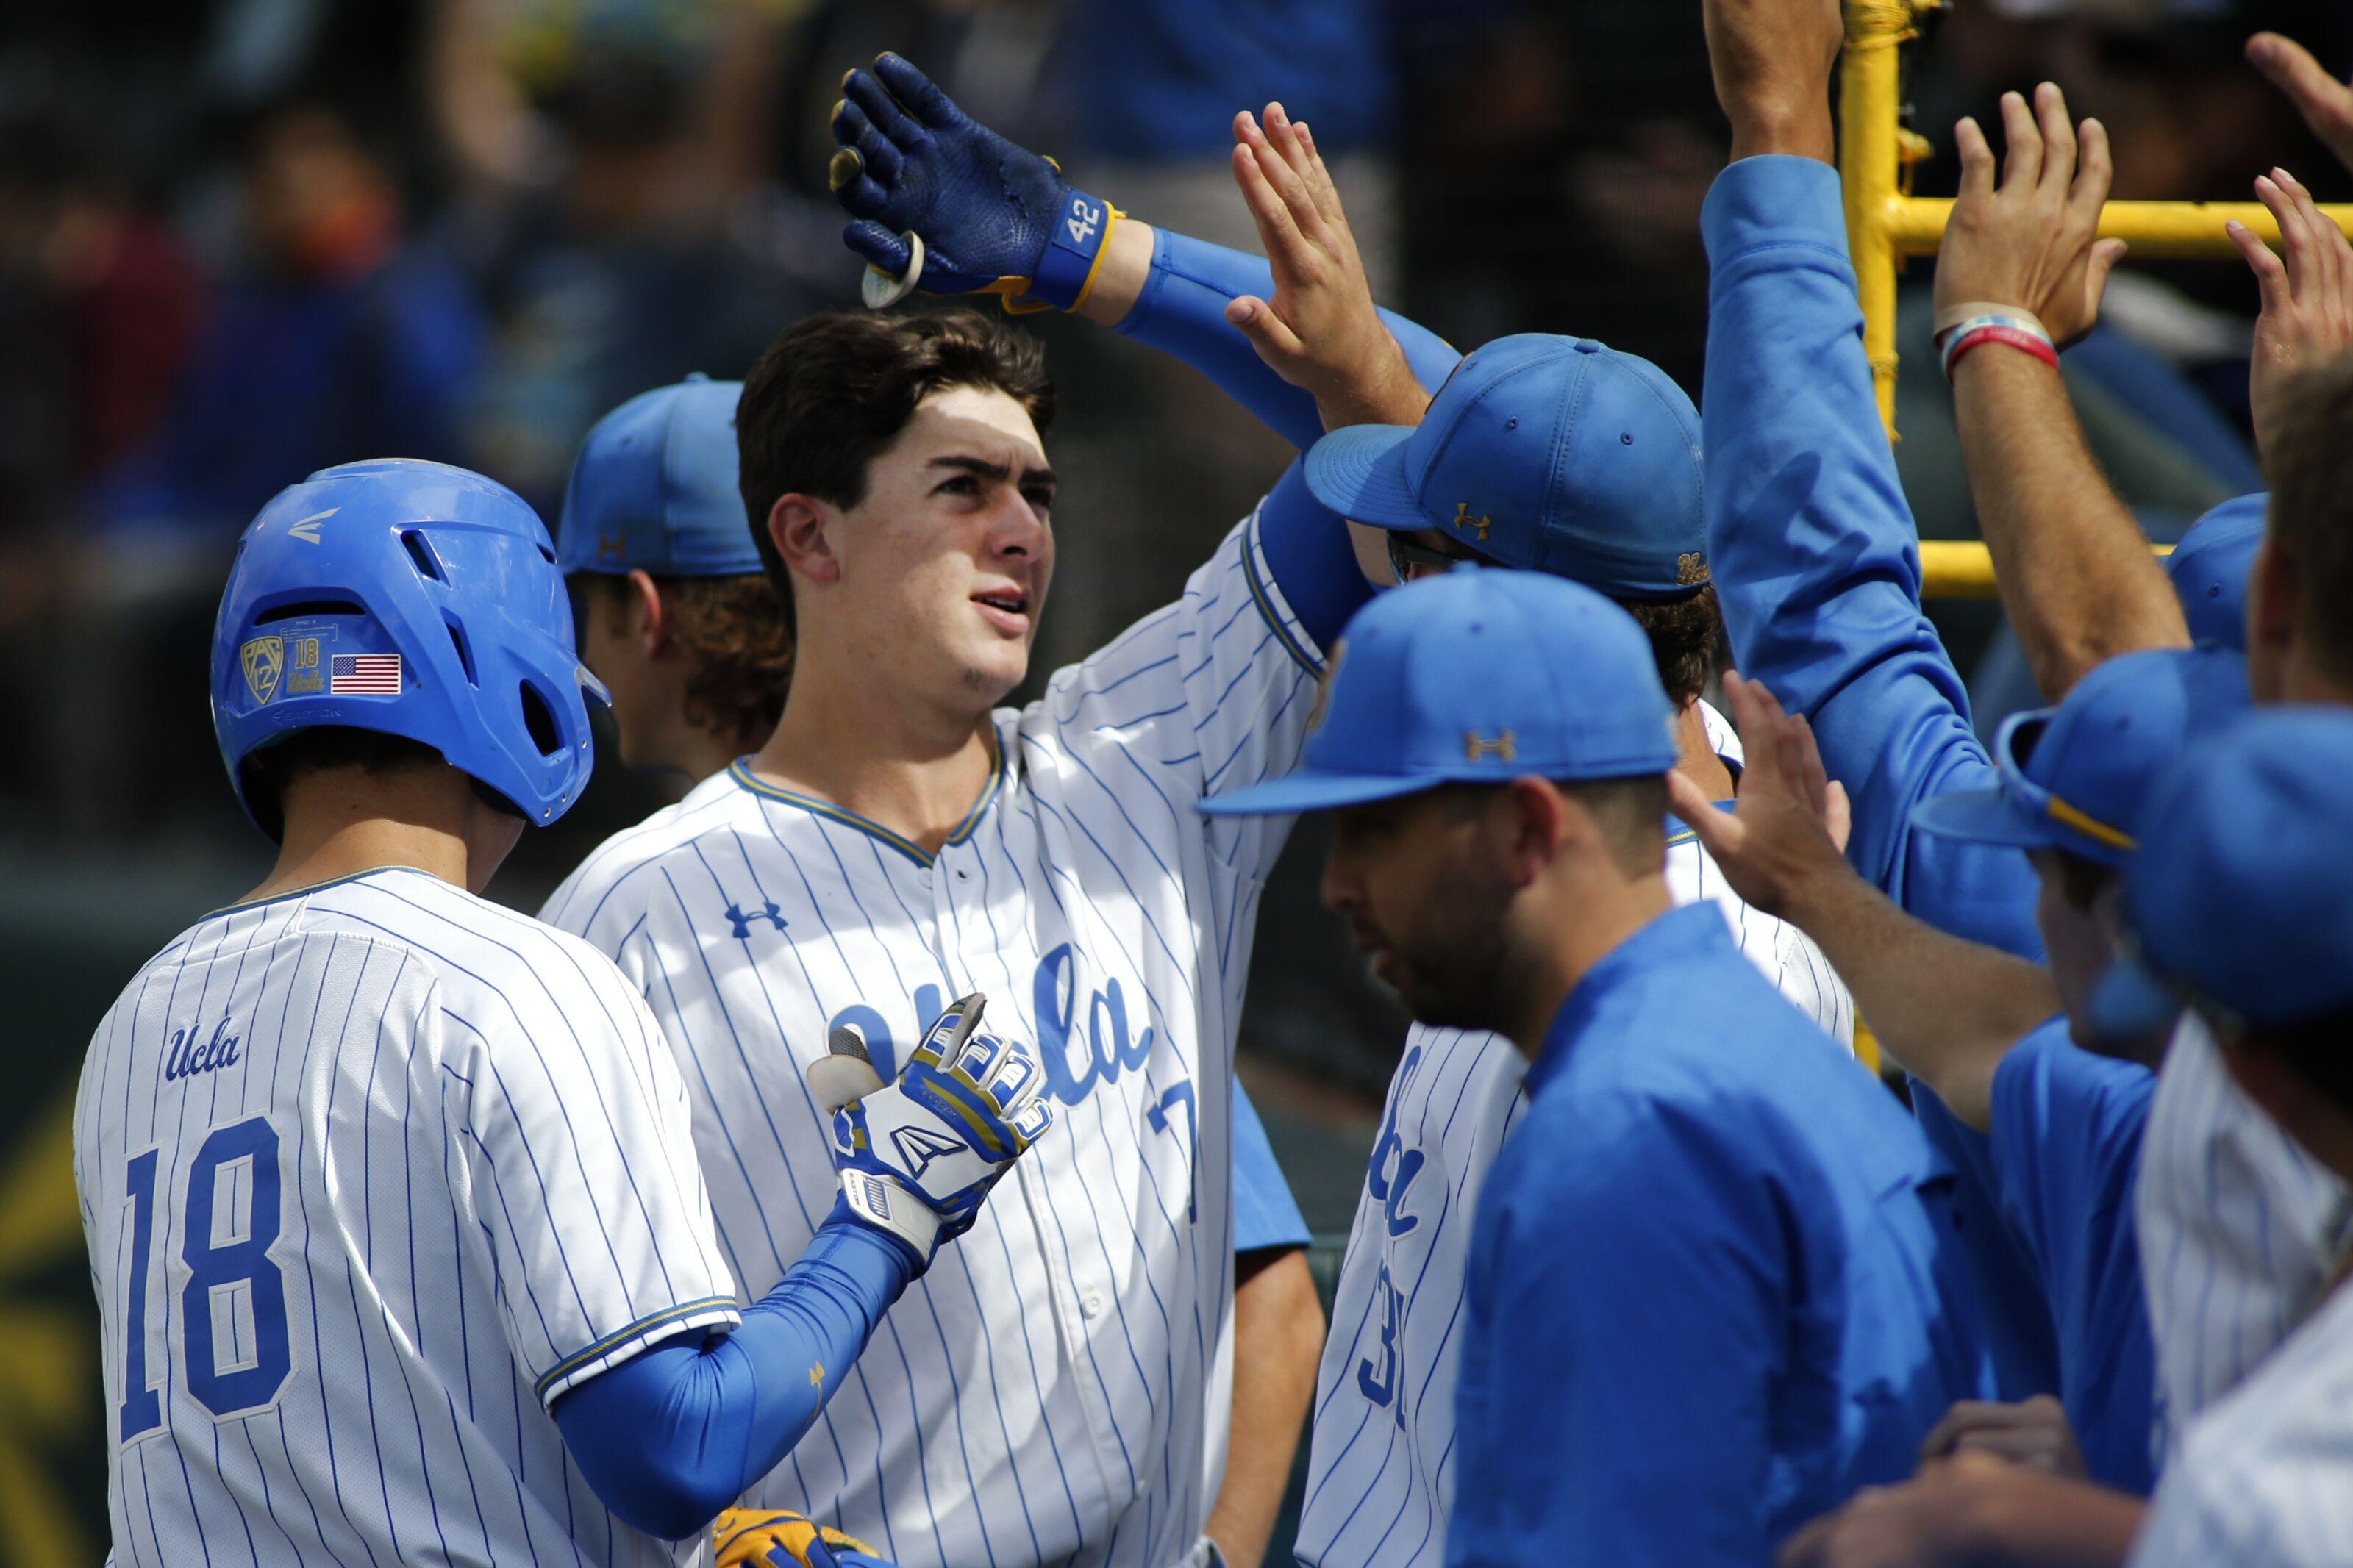 UCLA Baseball: Bruins clinch the 2019 Pac-12 Championship